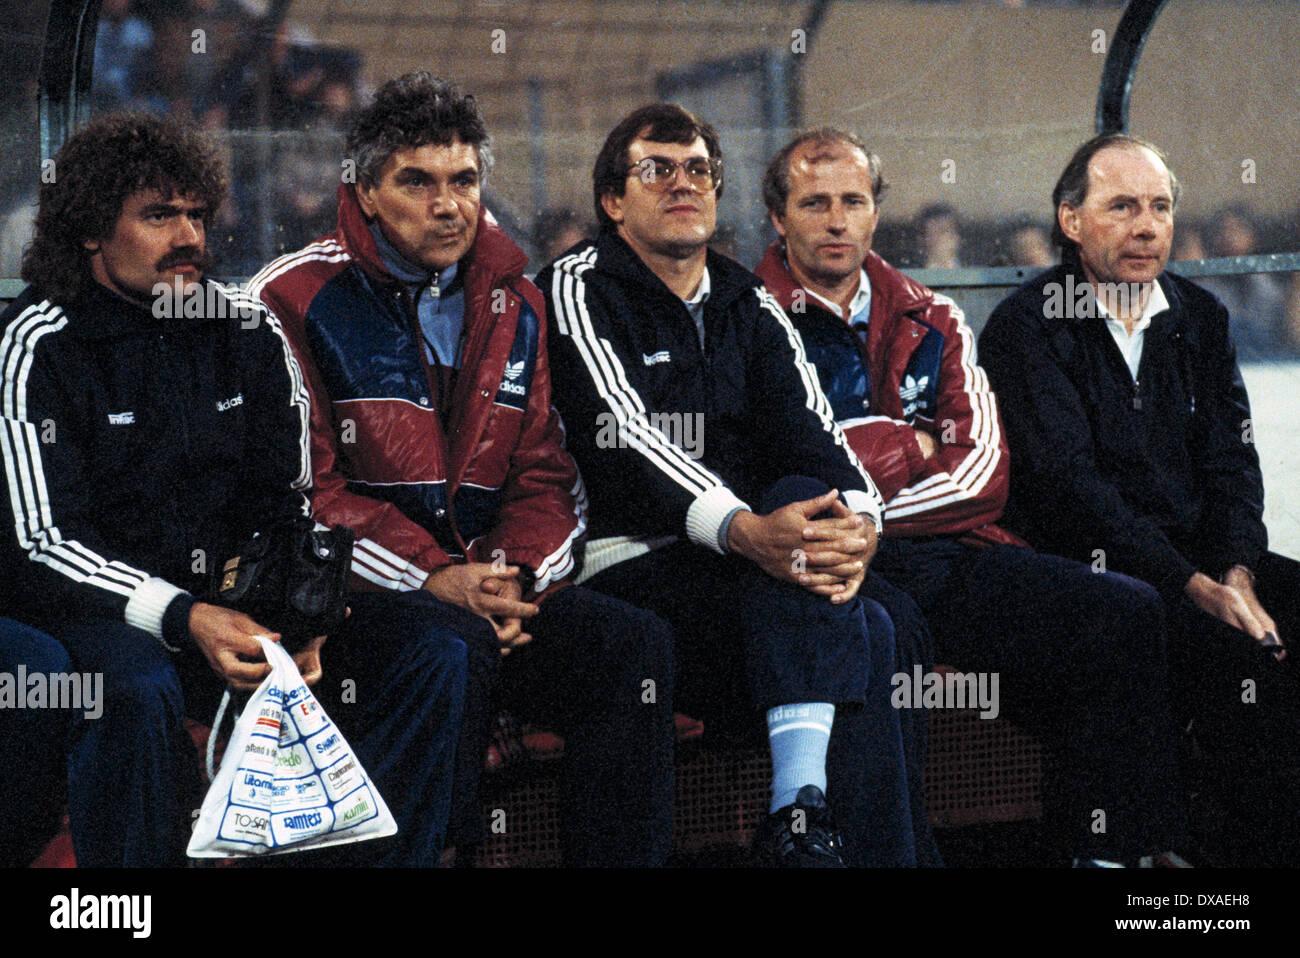 football, 1. Bundesliga, 2. Bundesliga, 1983/1984, relegation match to Bundesliga 1984/1985, first leg, Wedau Stadium, MSV Duisburg versus Eintracht Frankfurt 0:5, coaching bench Frankfurt with coach Dietrich Weise (right), Willi Neuberger (2.f.r.), masse - Stock Image